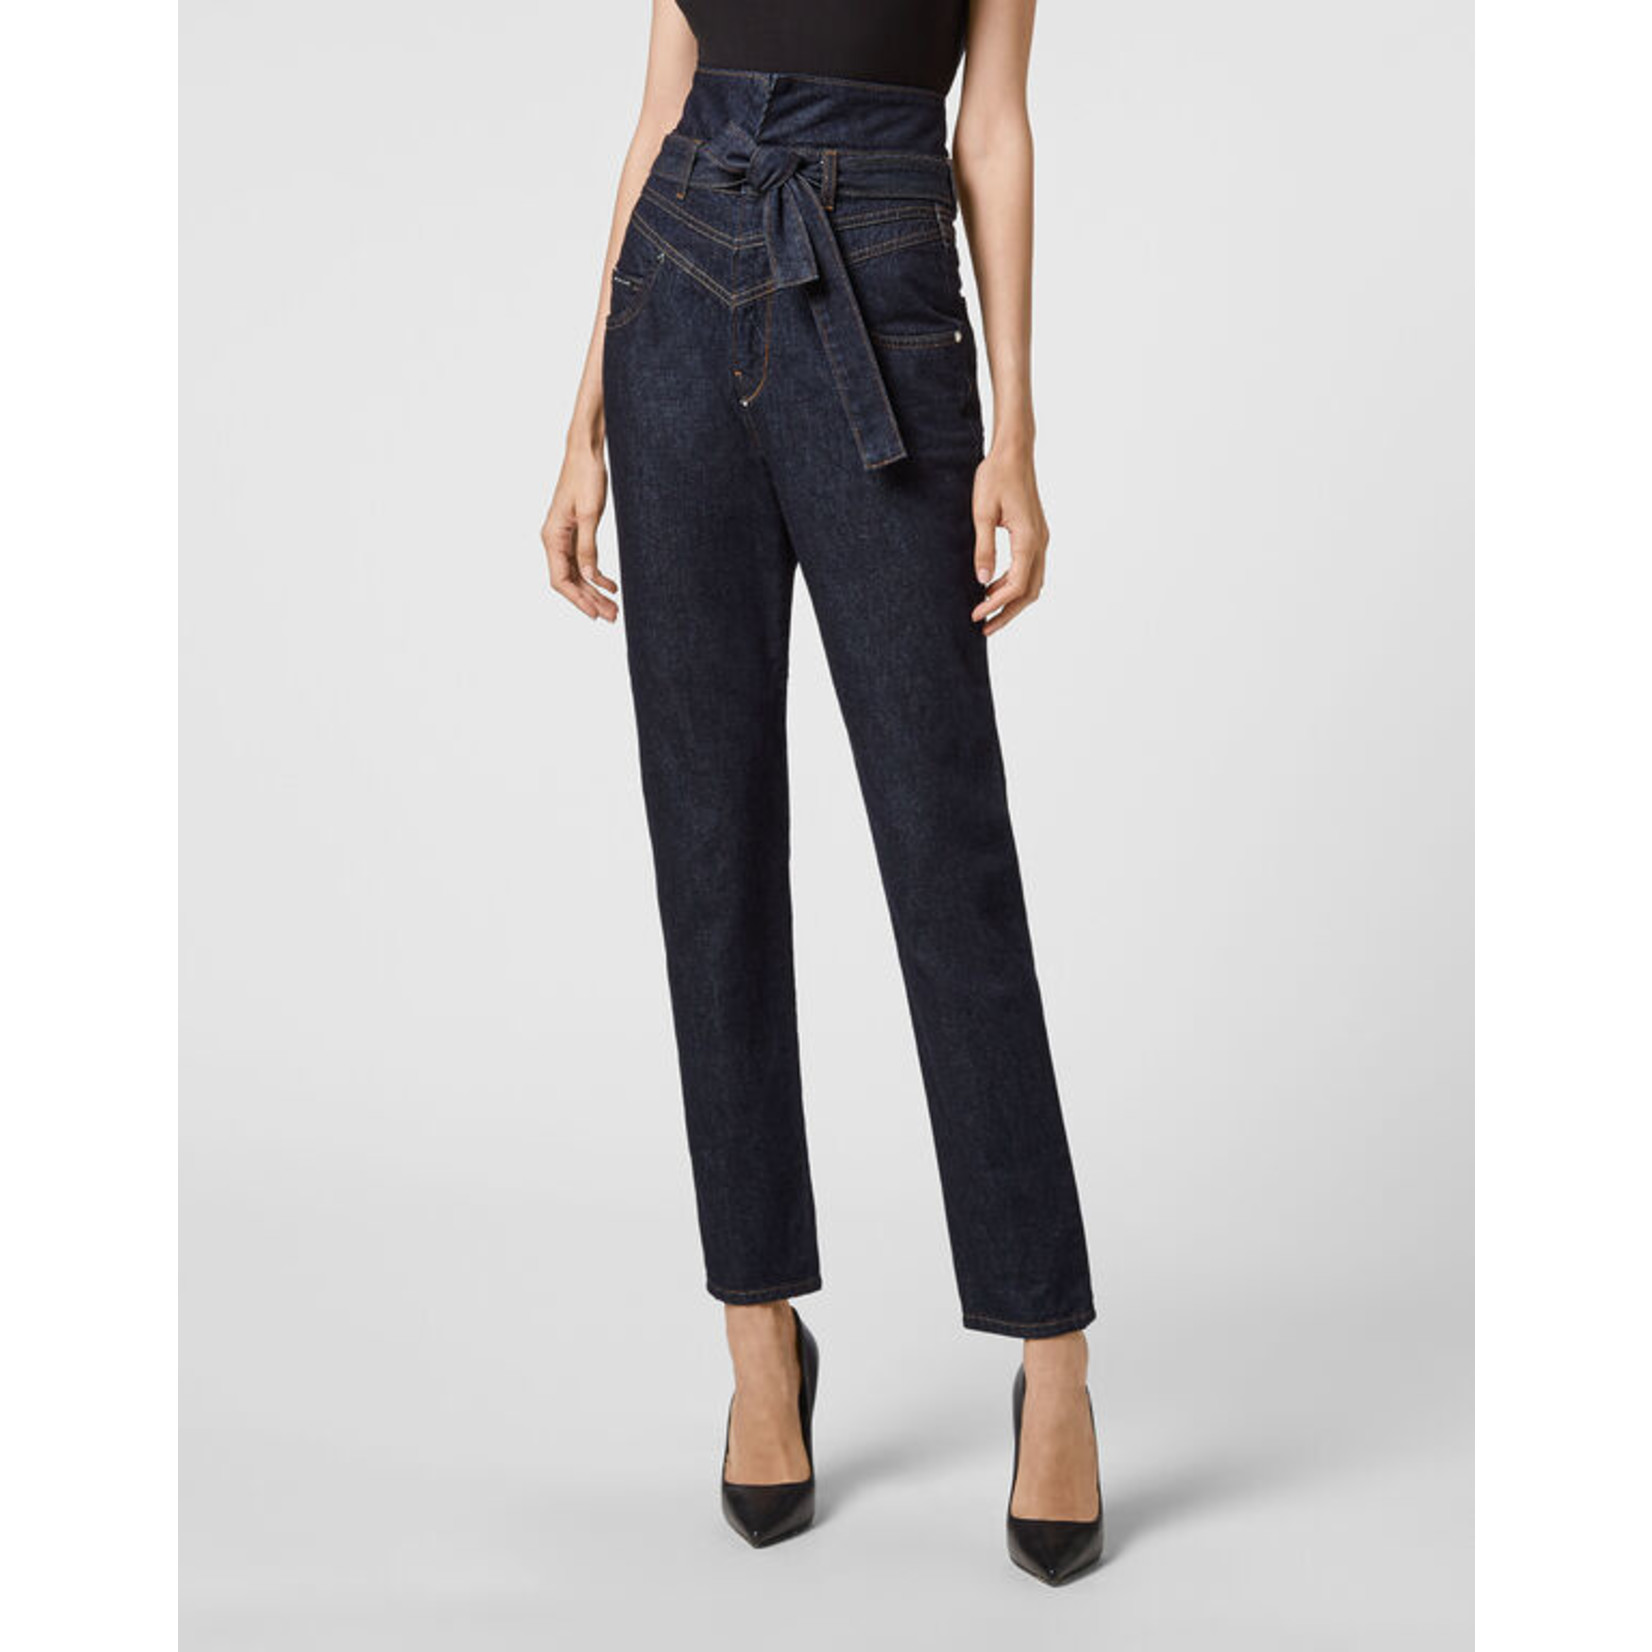 Philipp Plein Jeans 42859